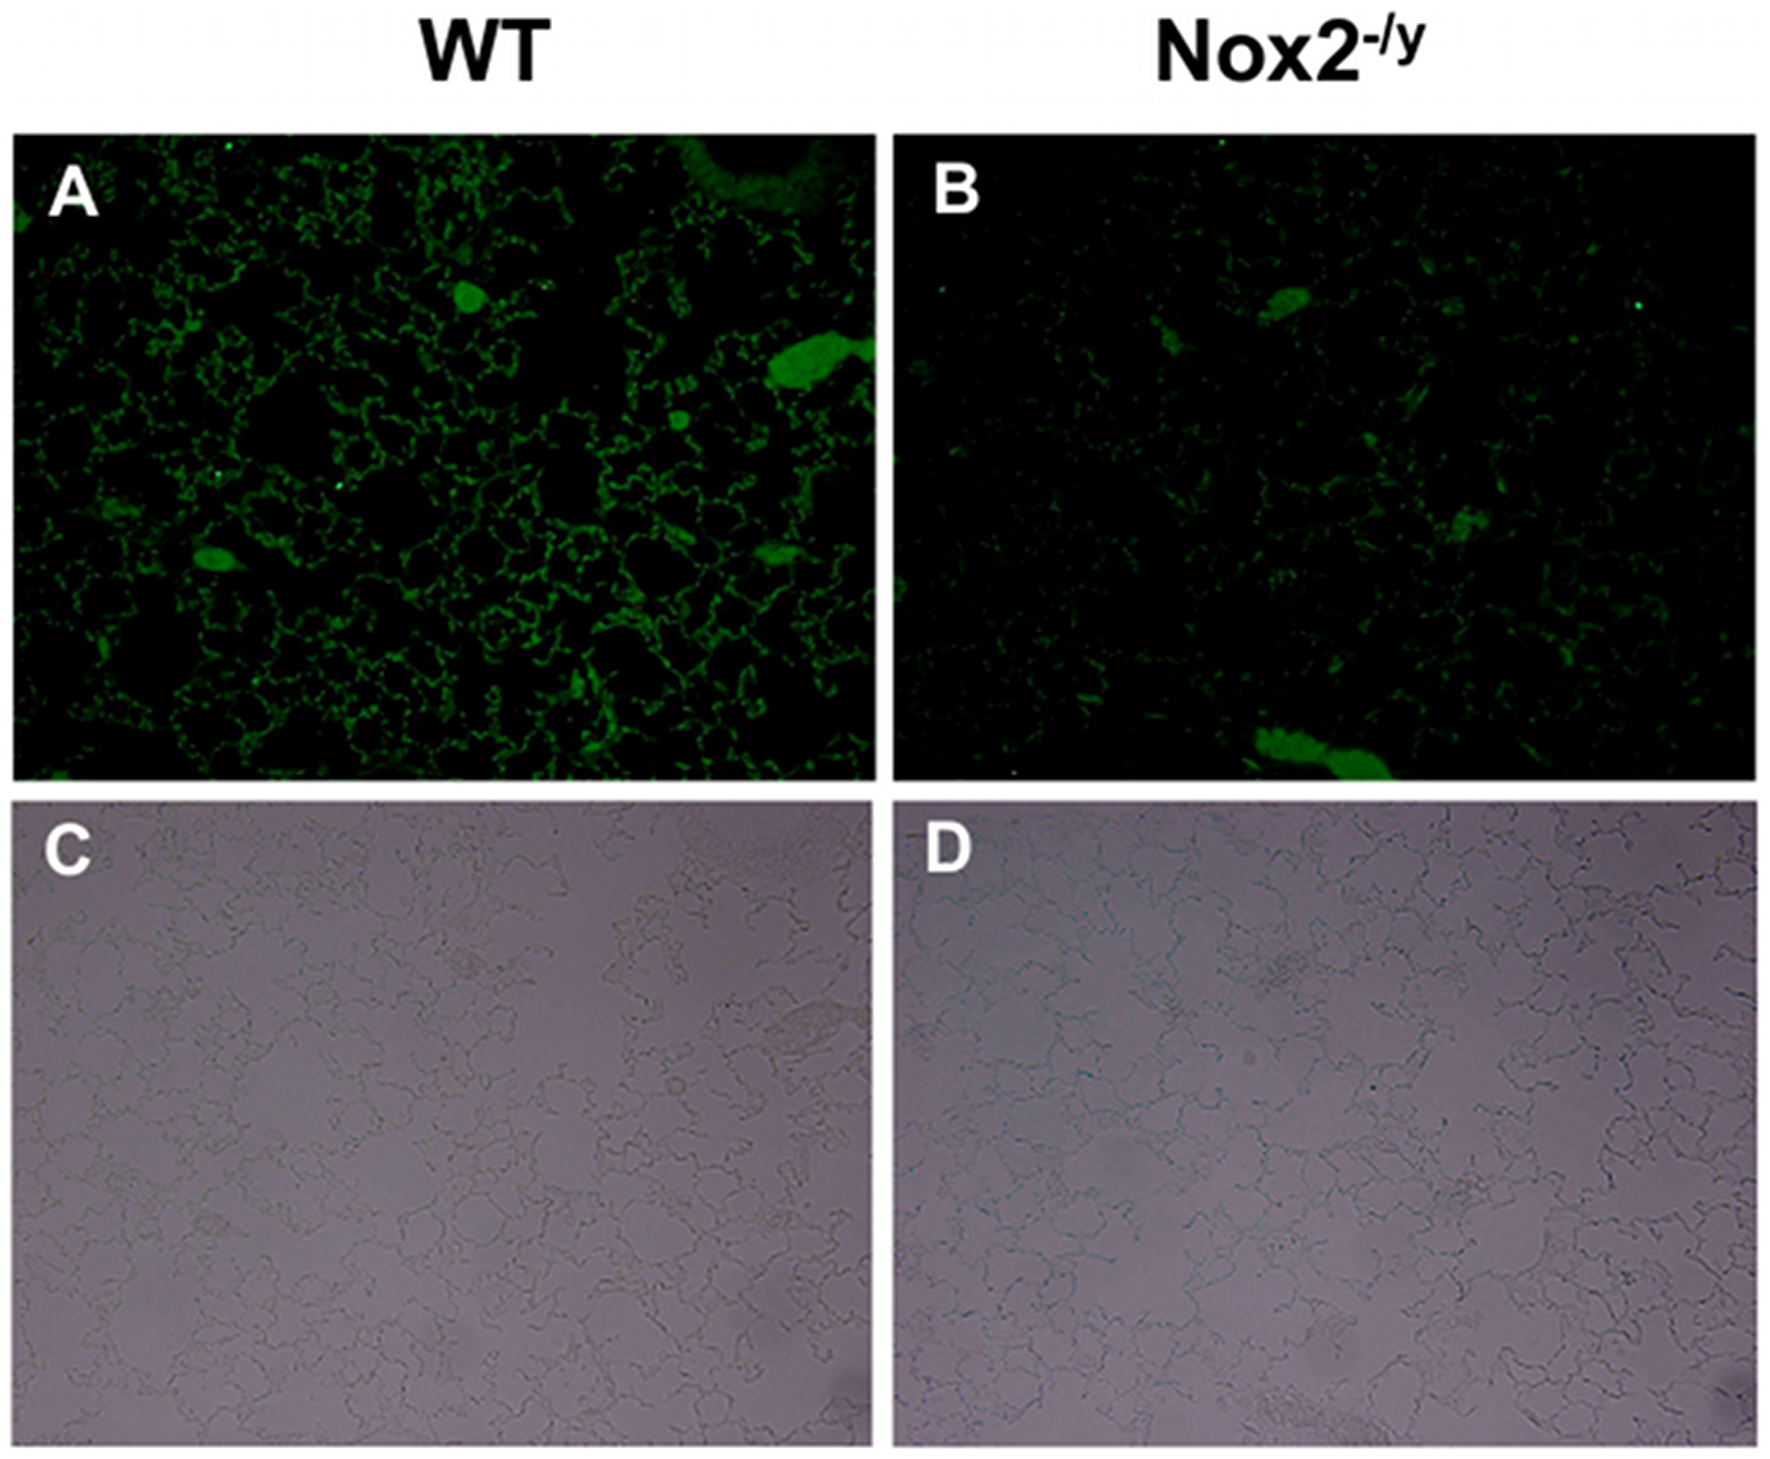 Cleaved caspase 3 immunofluorescence to assess lung alveolar epithelial apoptosis.